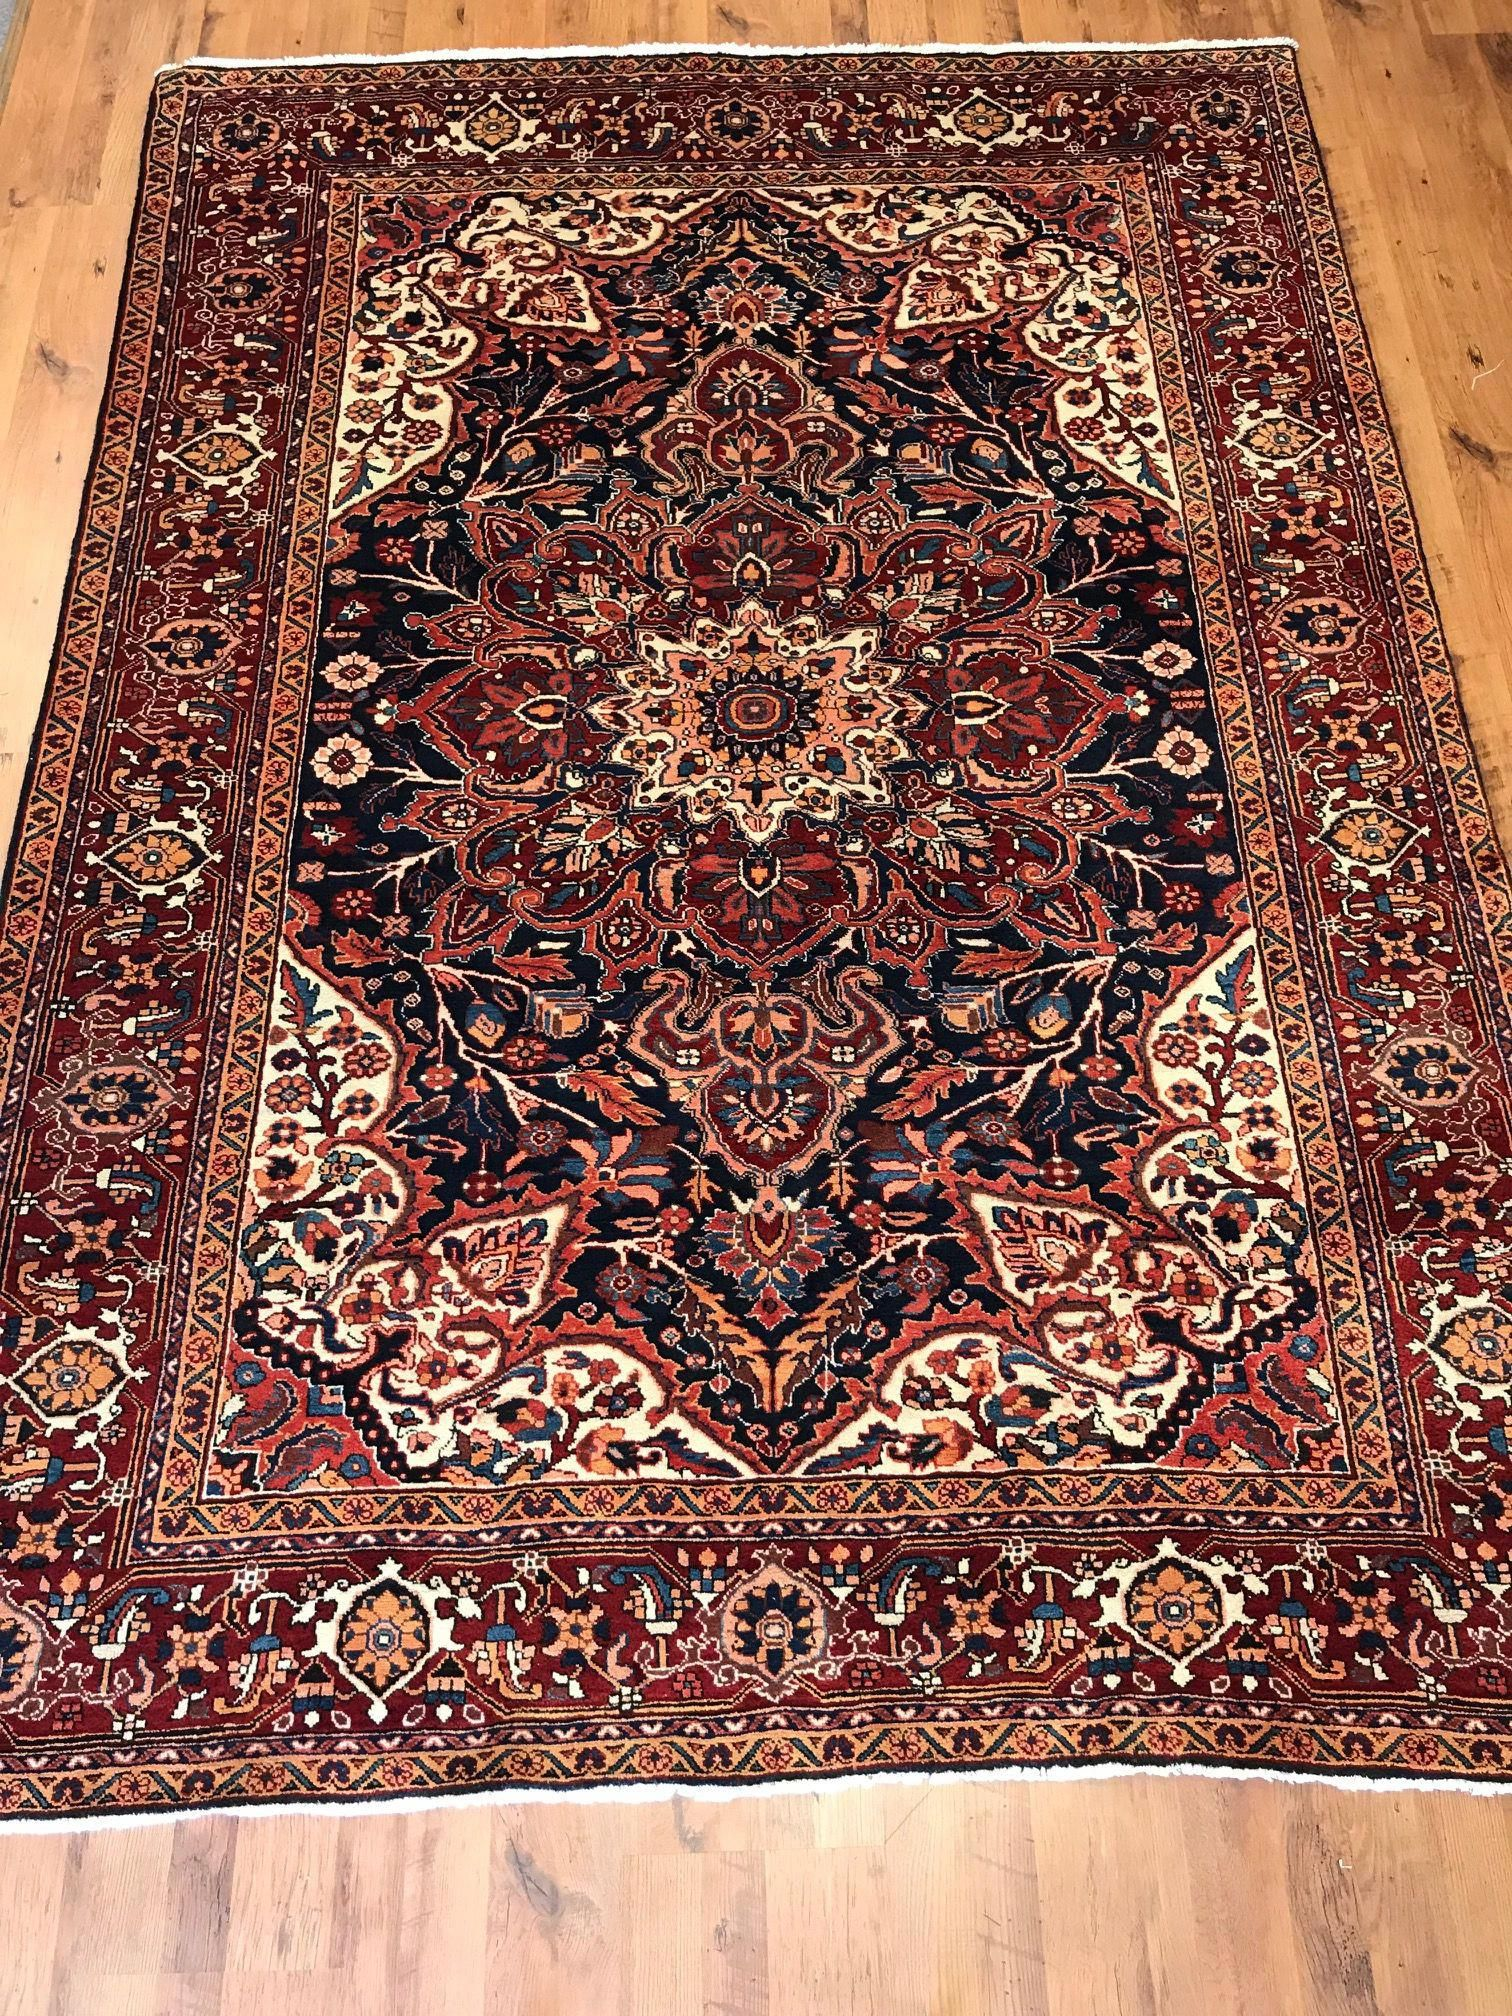 John Lewis Carpets Clearance Carpetsremnantsfor Product